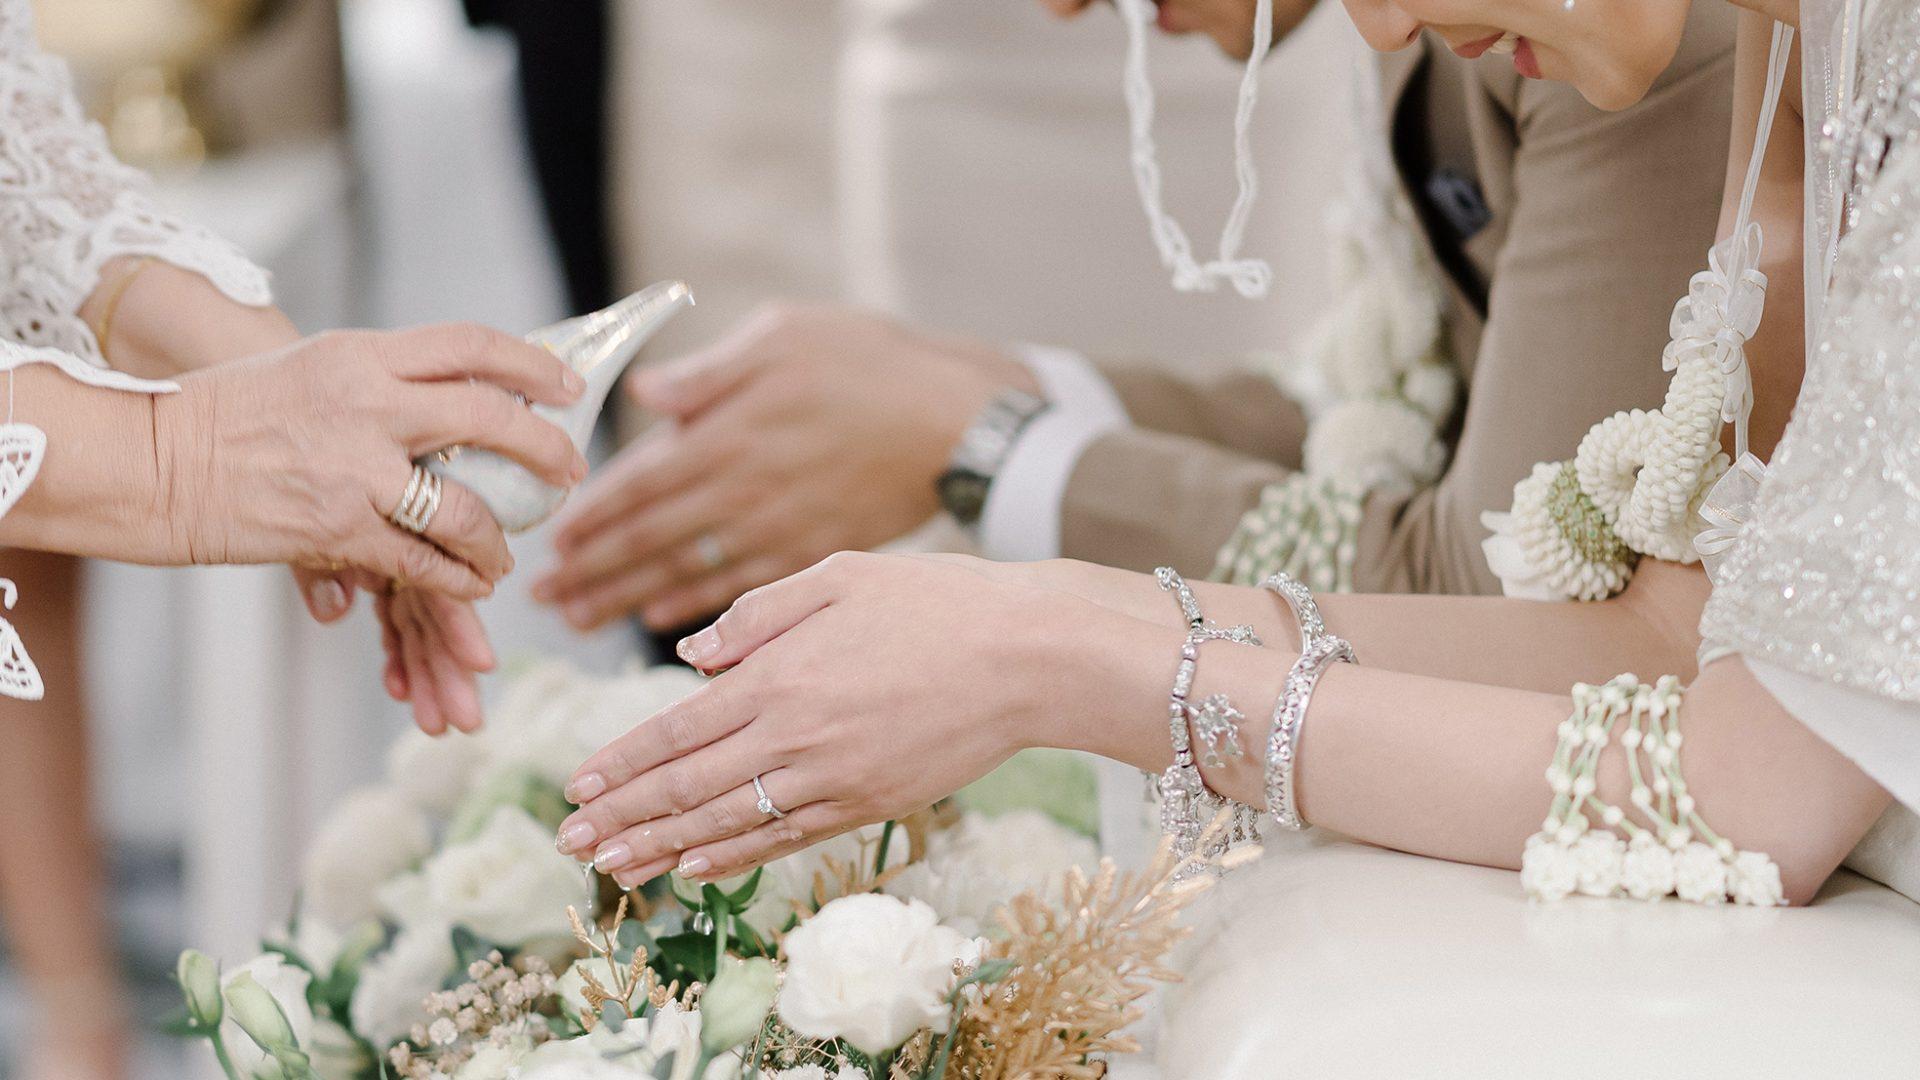 Thai wedding ceremony at Pullman Bangkok Hotel G